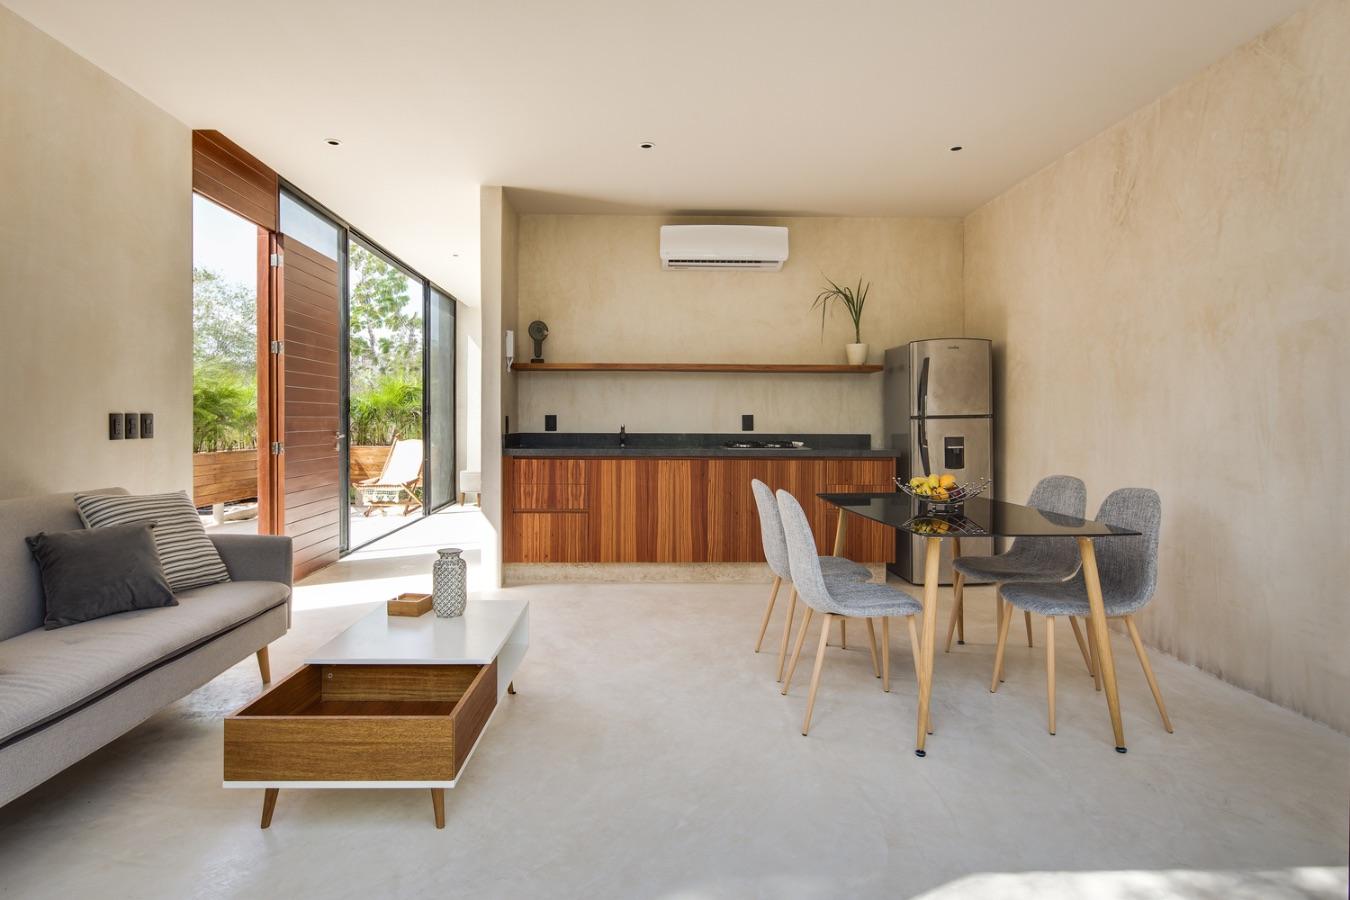 13_Ka'a Tulum Housing Complex_Studio Arquitectos_Inspirationist